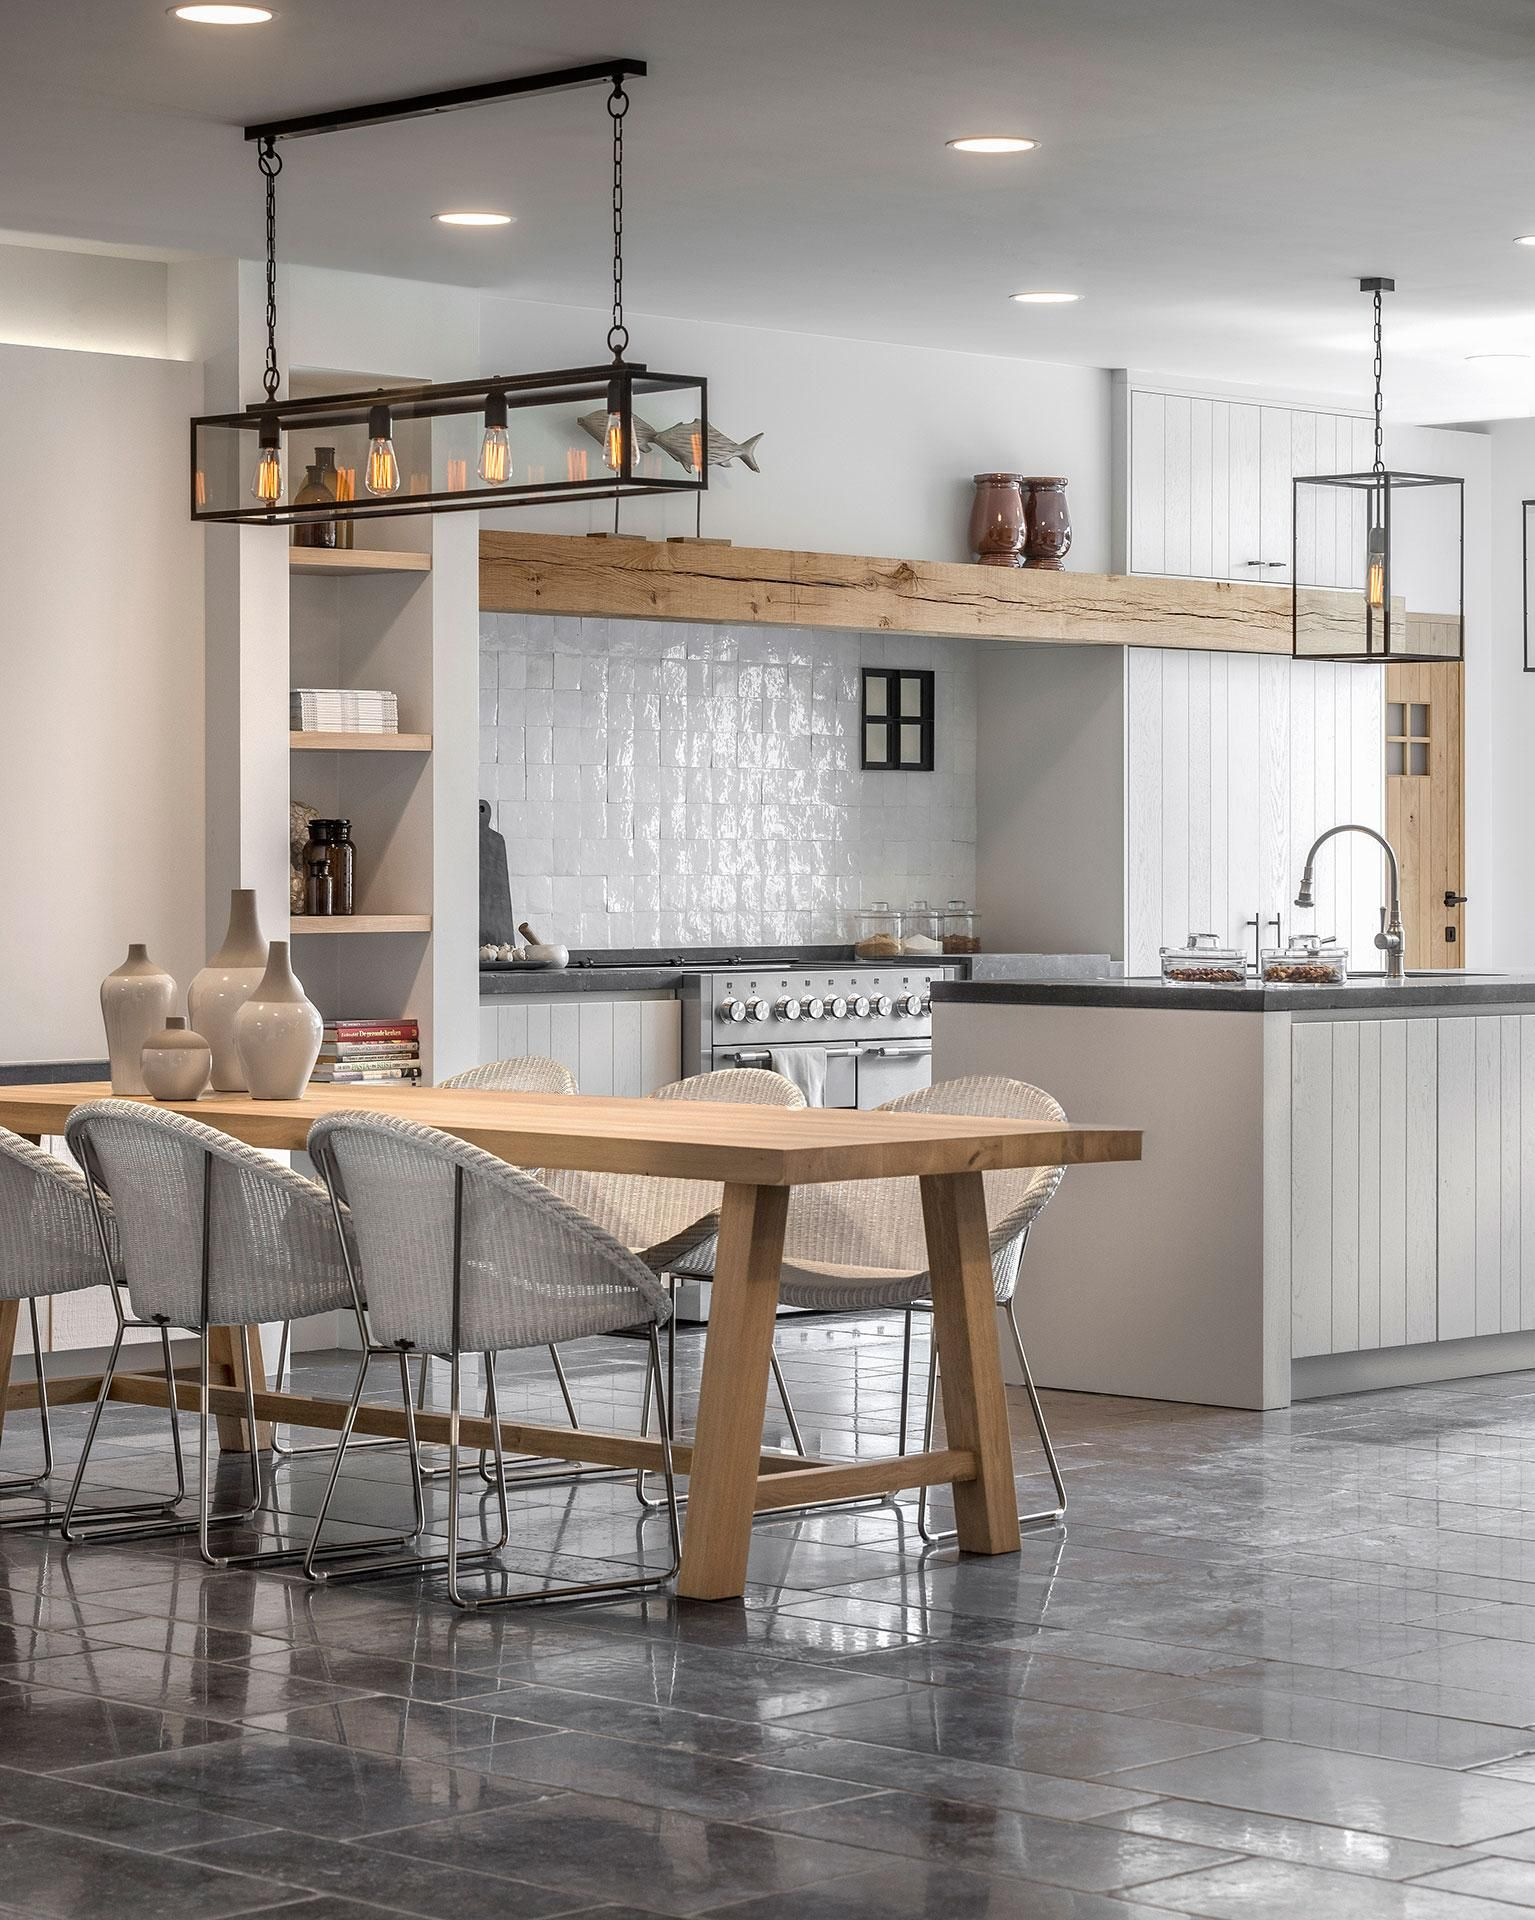 Landelijke keukens freja home styling huis tuin pinterest keukens keuken en met - Moderne keuken deco keuken ...